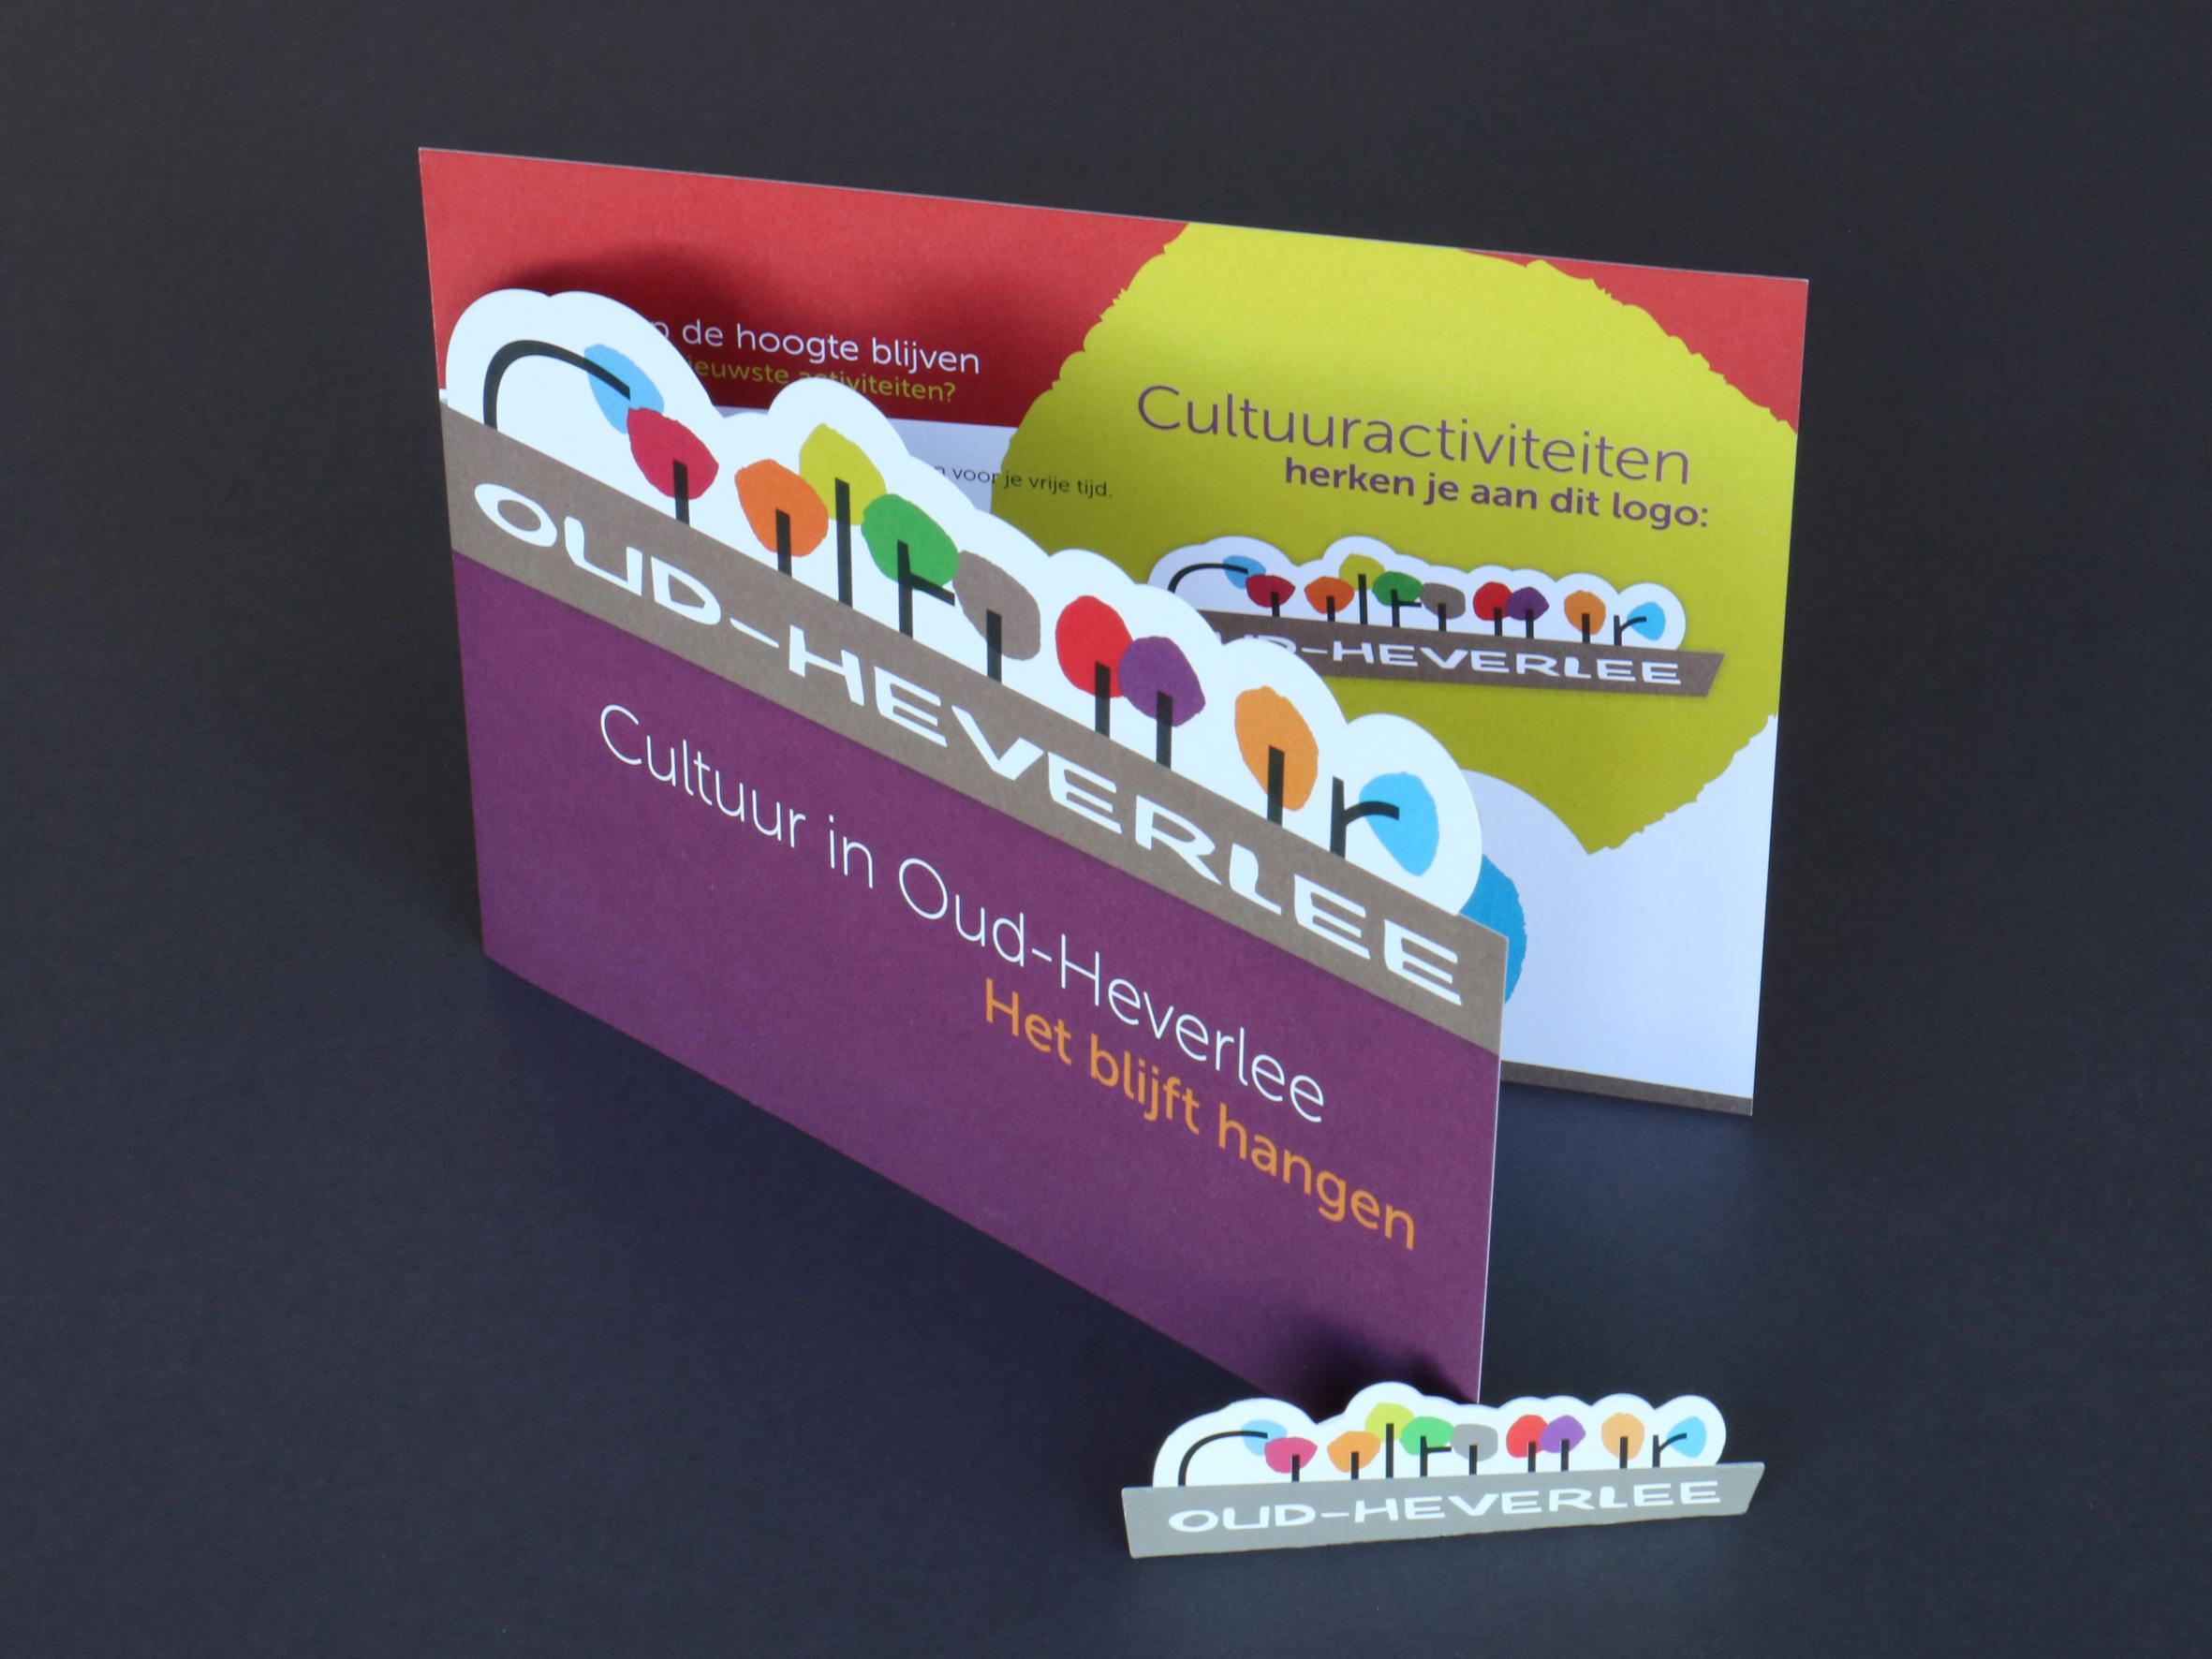 Promotiefolder & magneet Cultuurlogo Oud-Heverlee